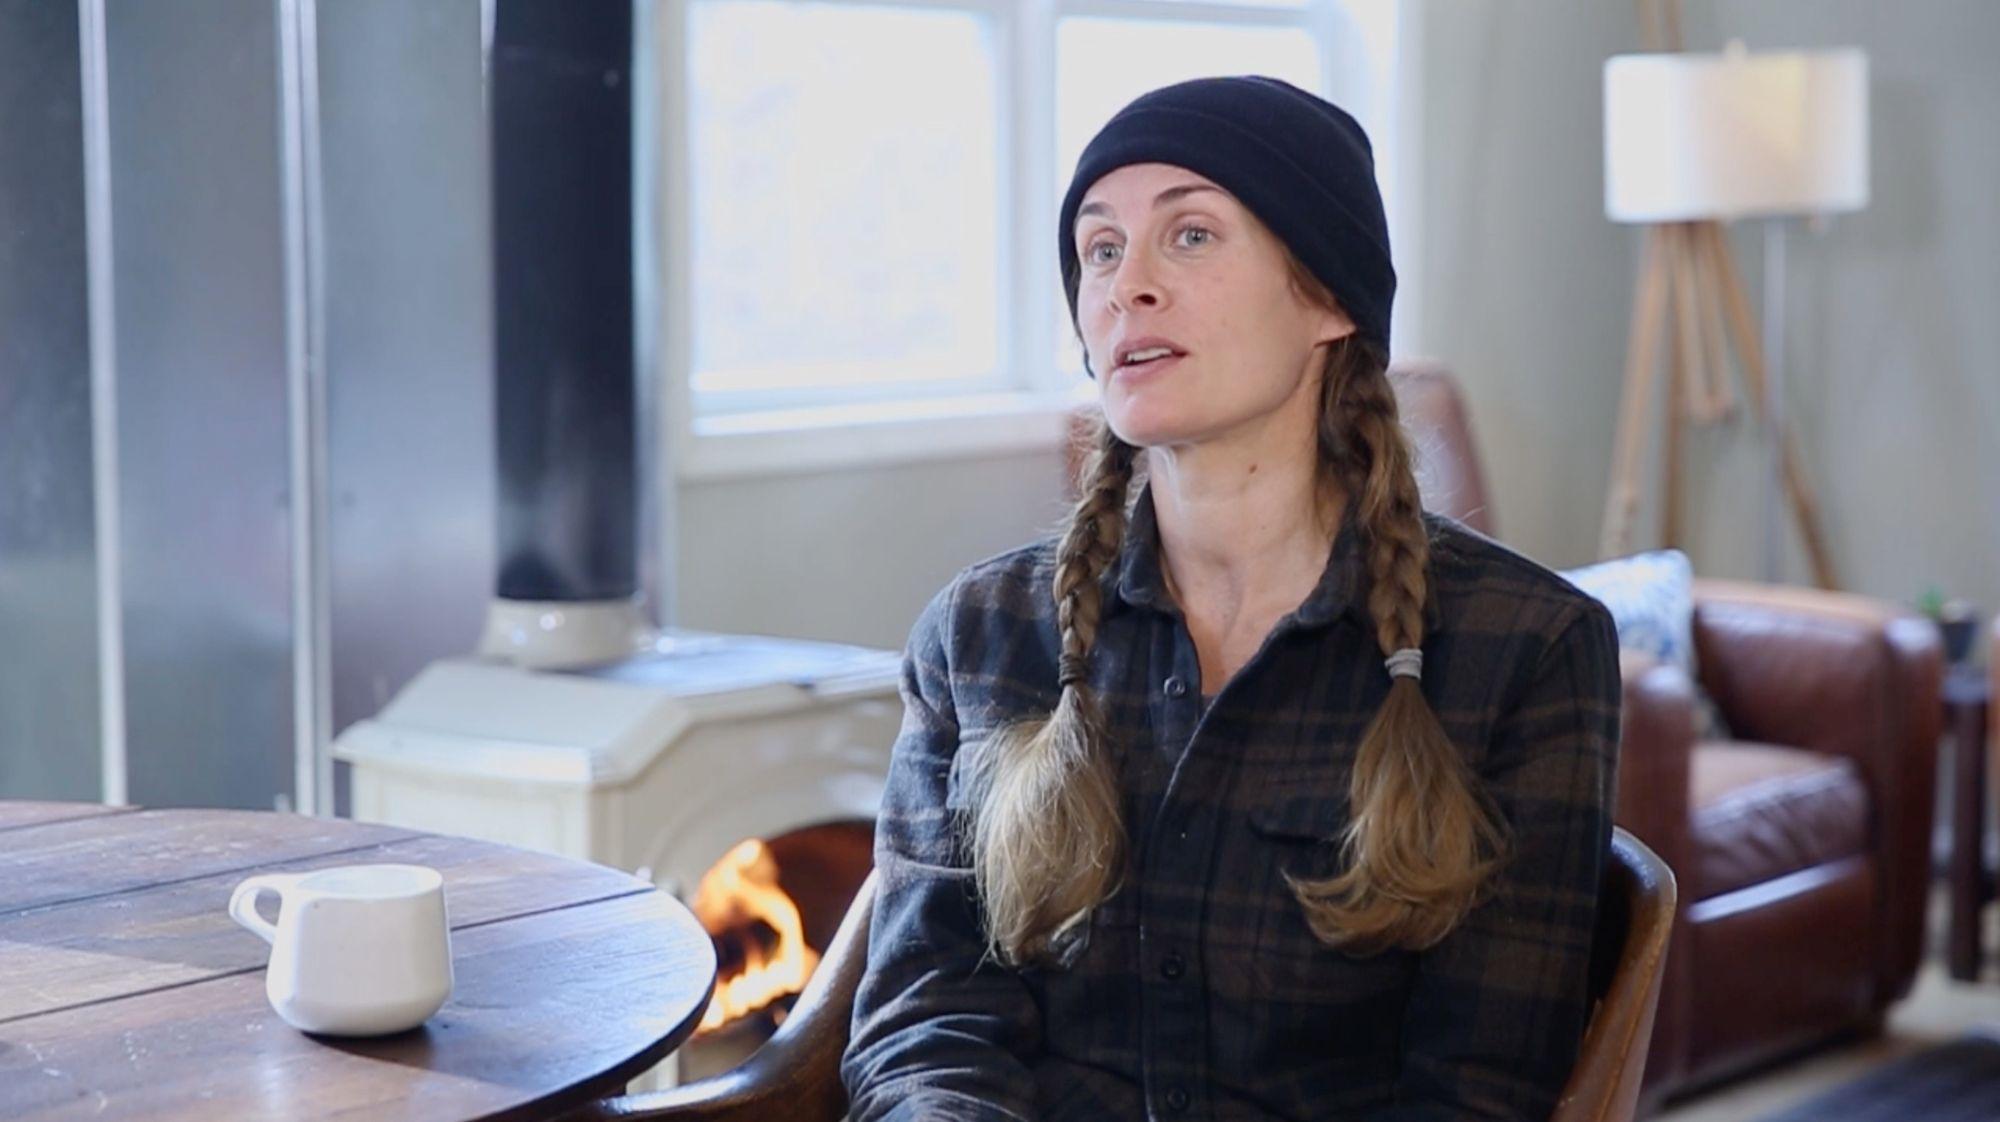 CampKeeper Profile: Clare Brettschneider